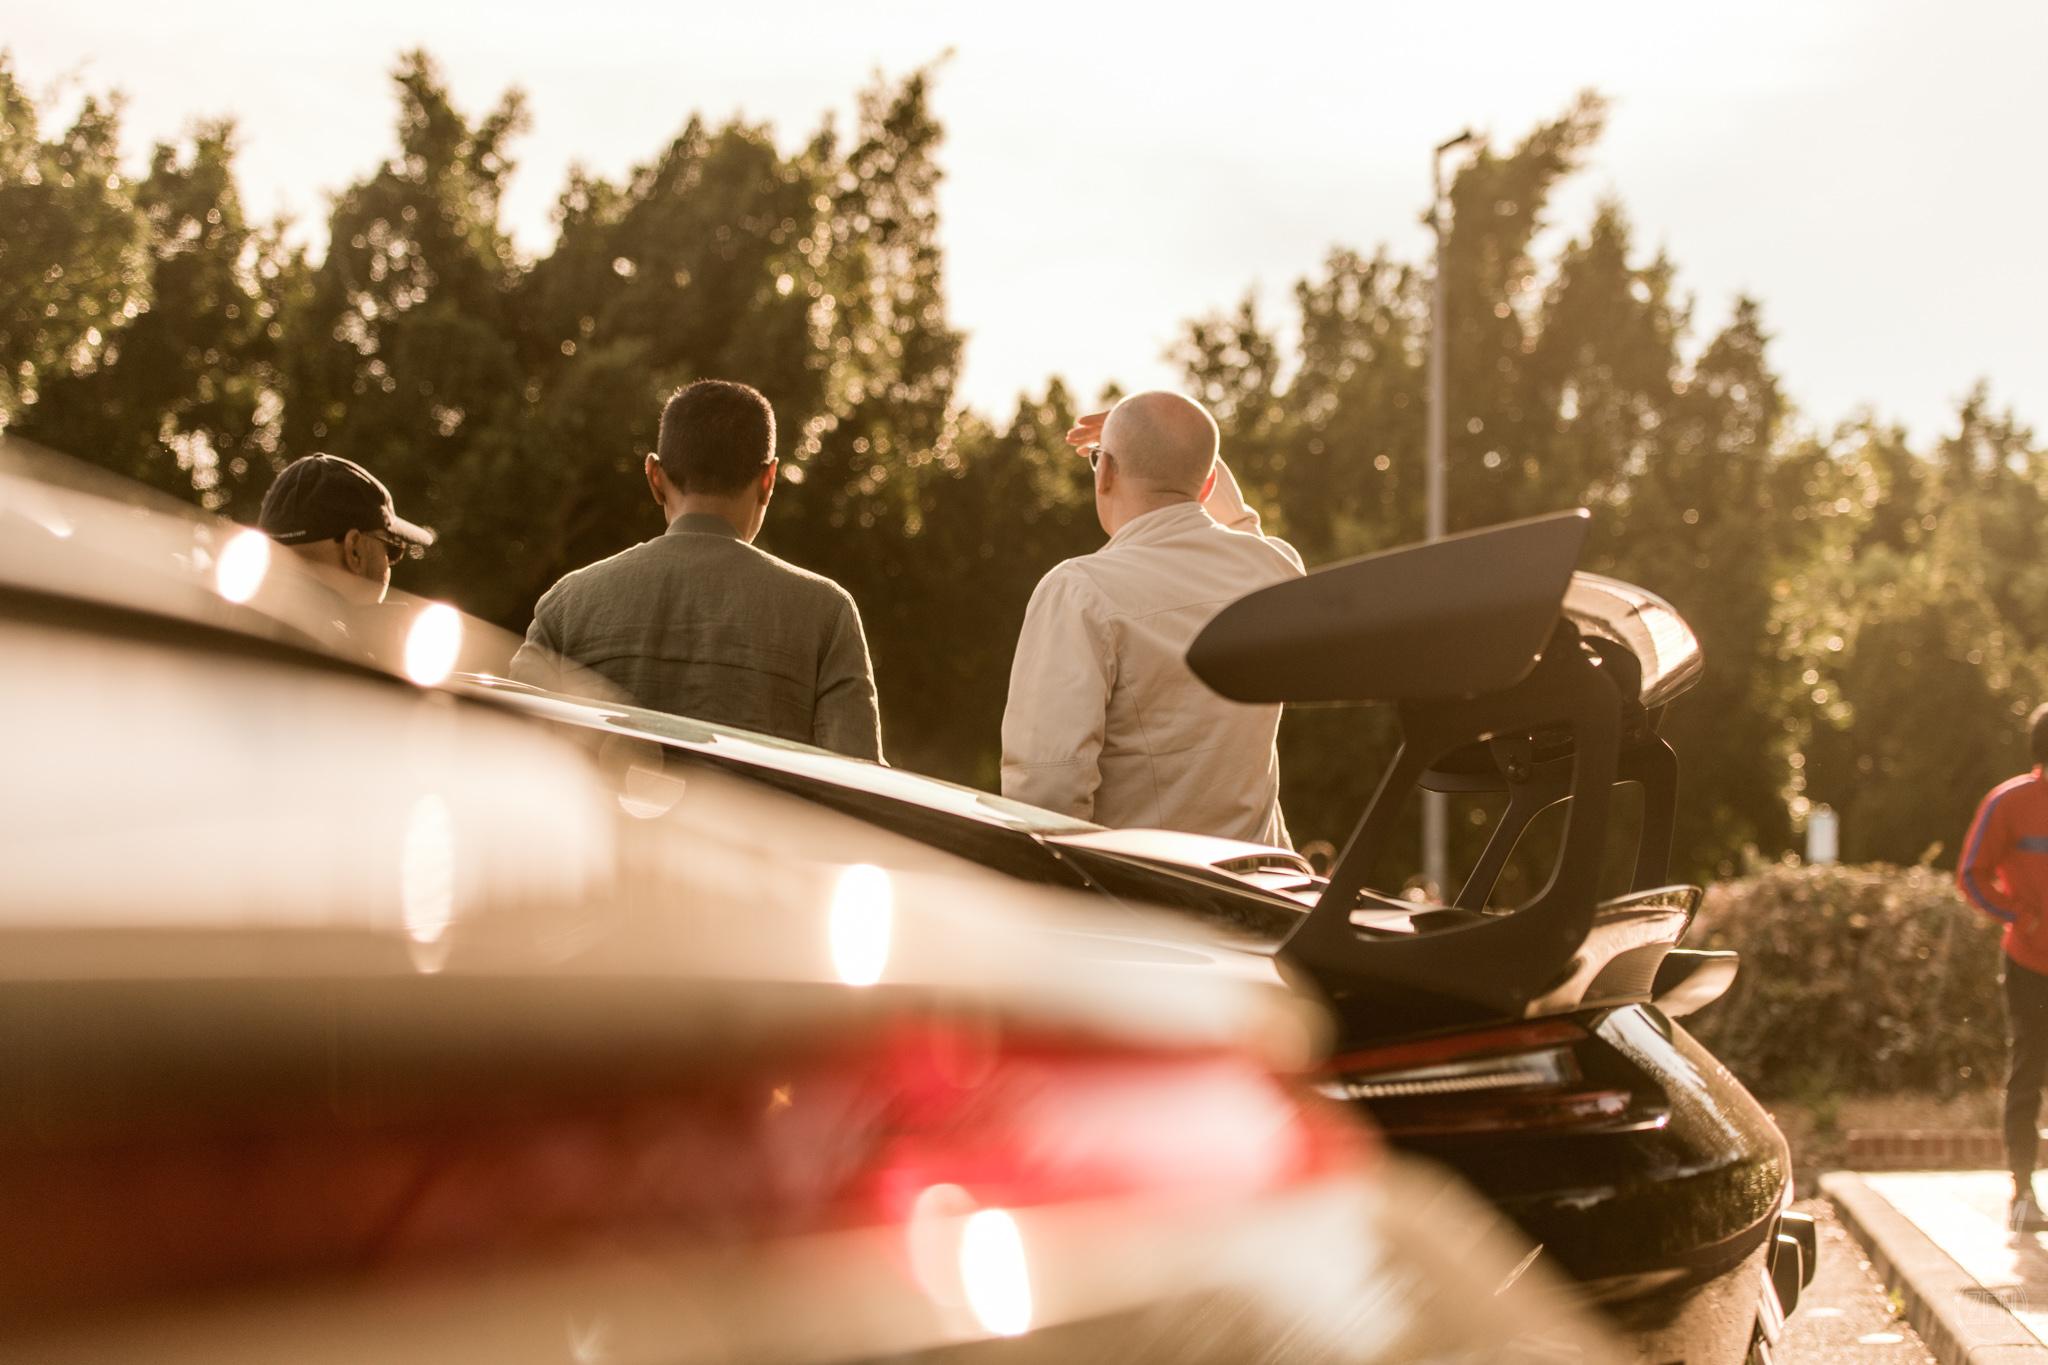 2019-10-27 - Autohaus Porsches & Coffee 099